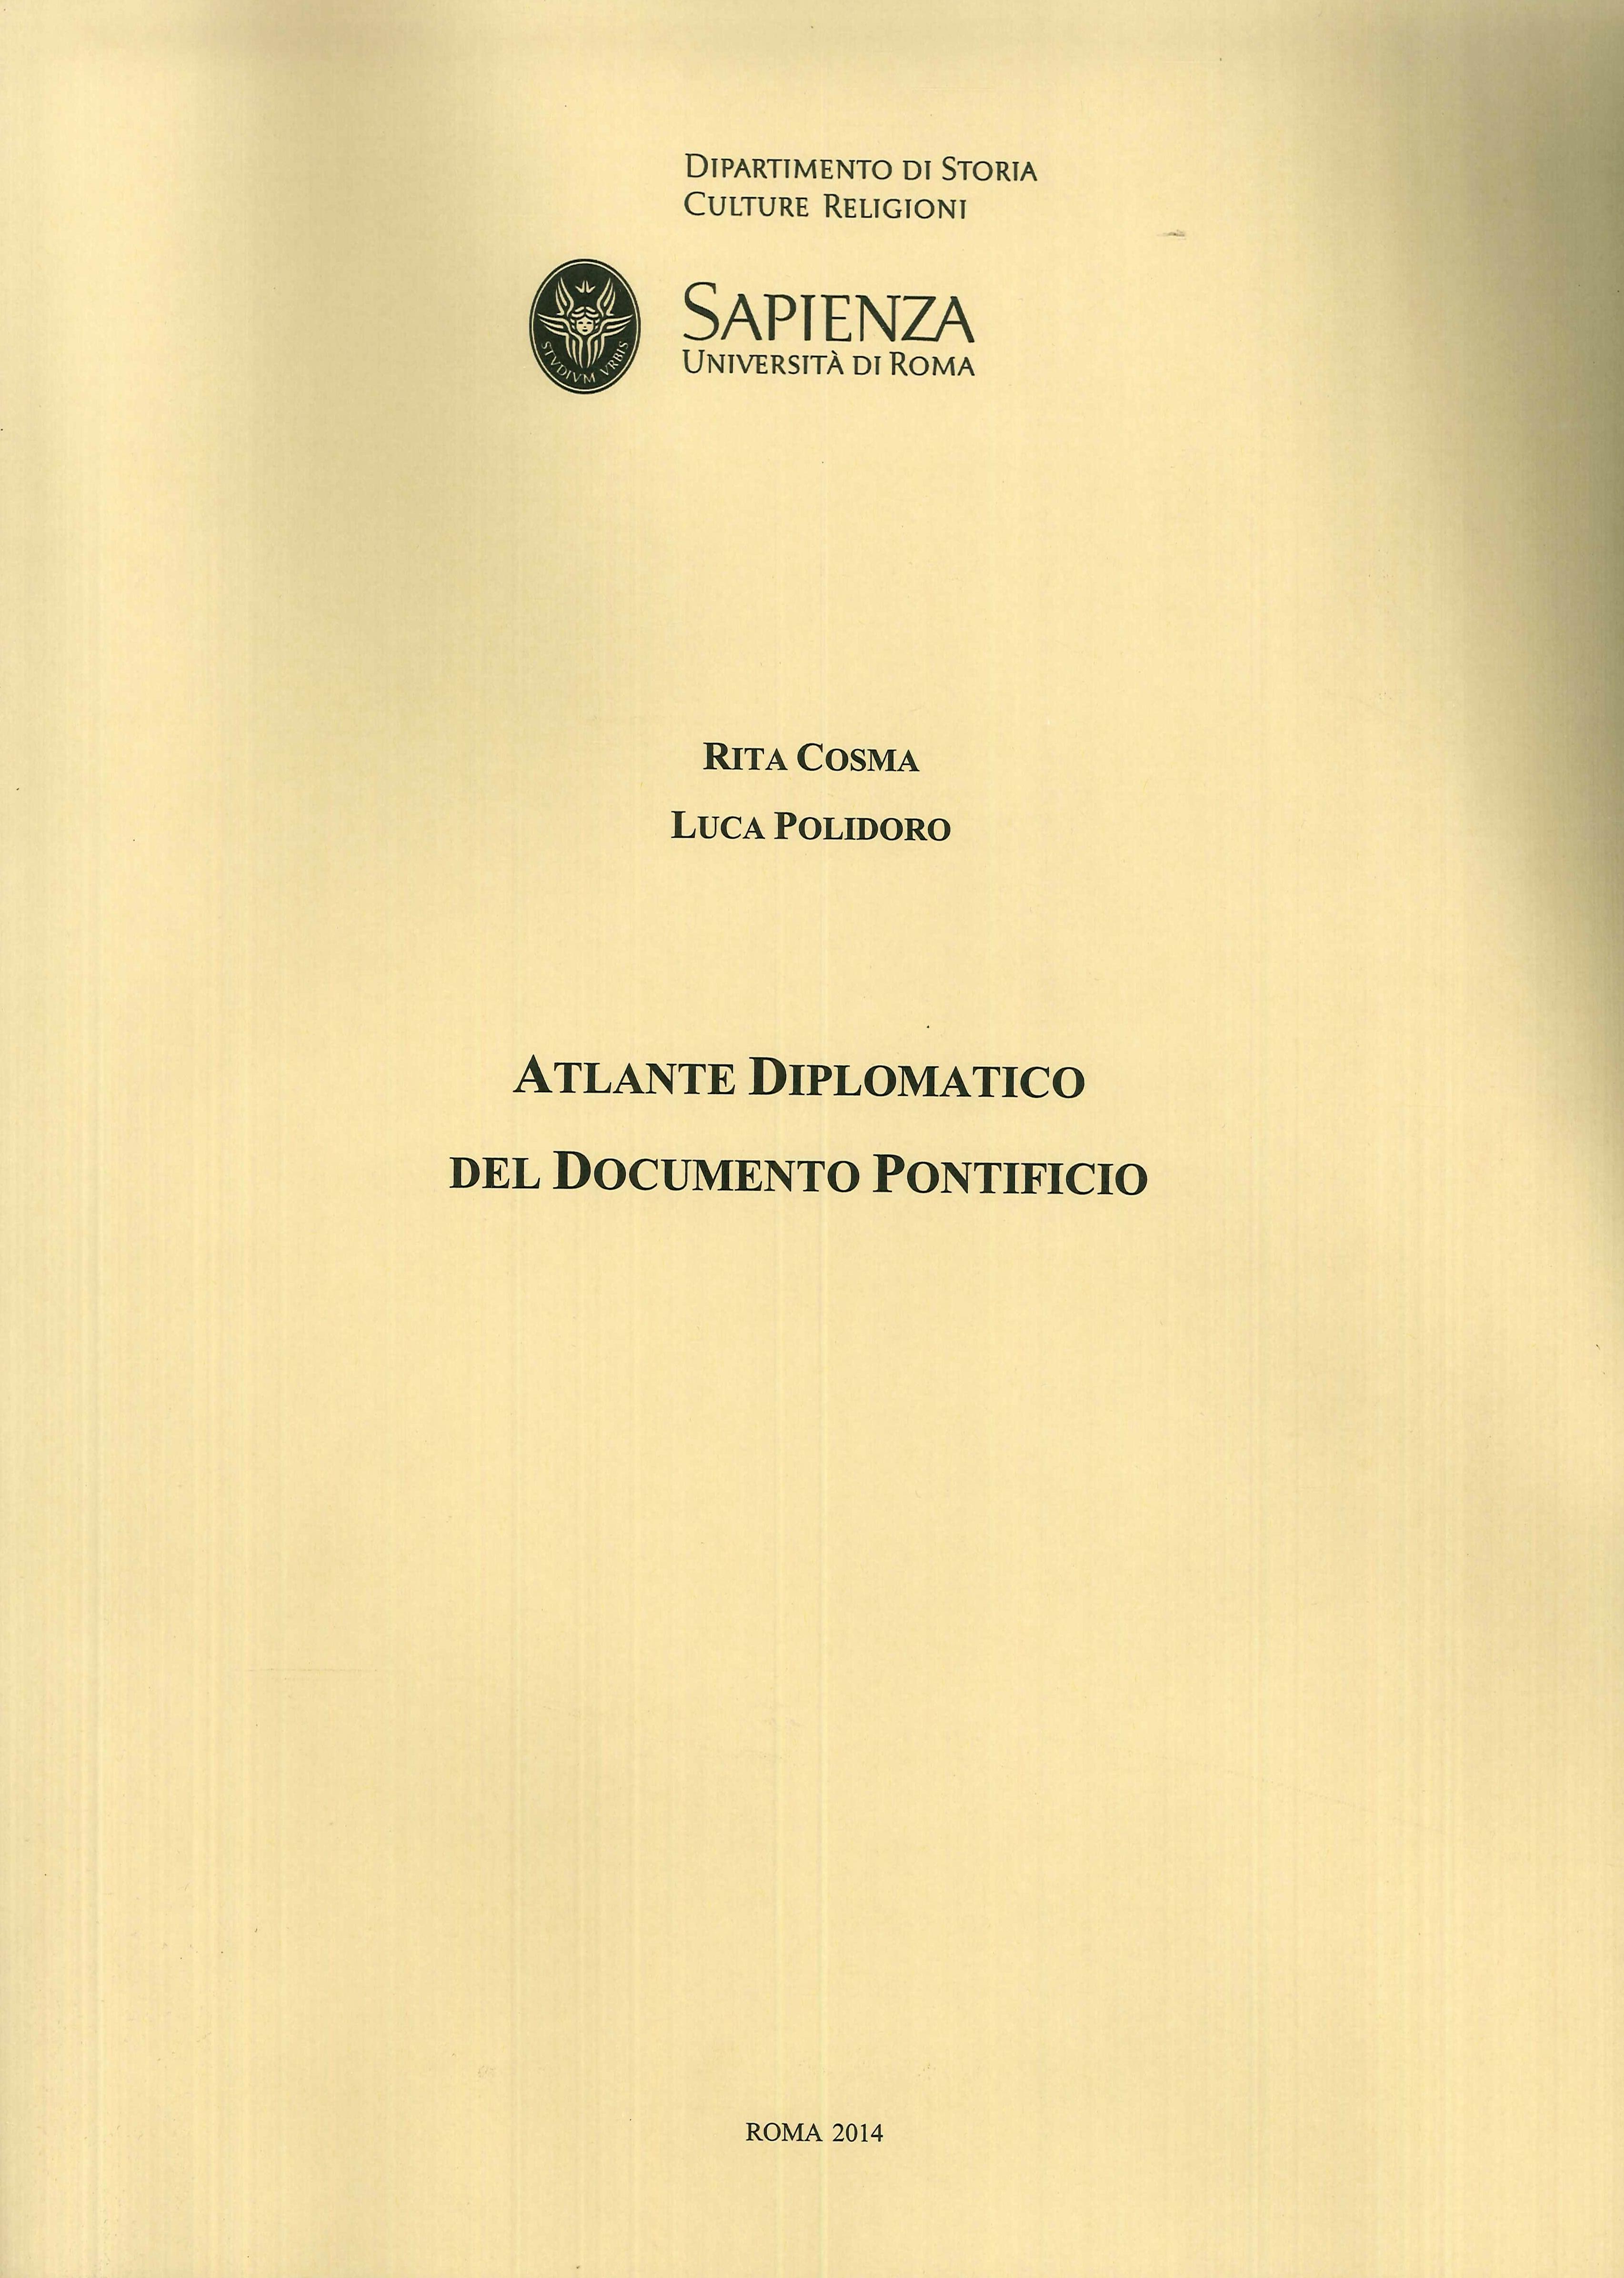 Atlante Diplomatico del Documento Pontificio